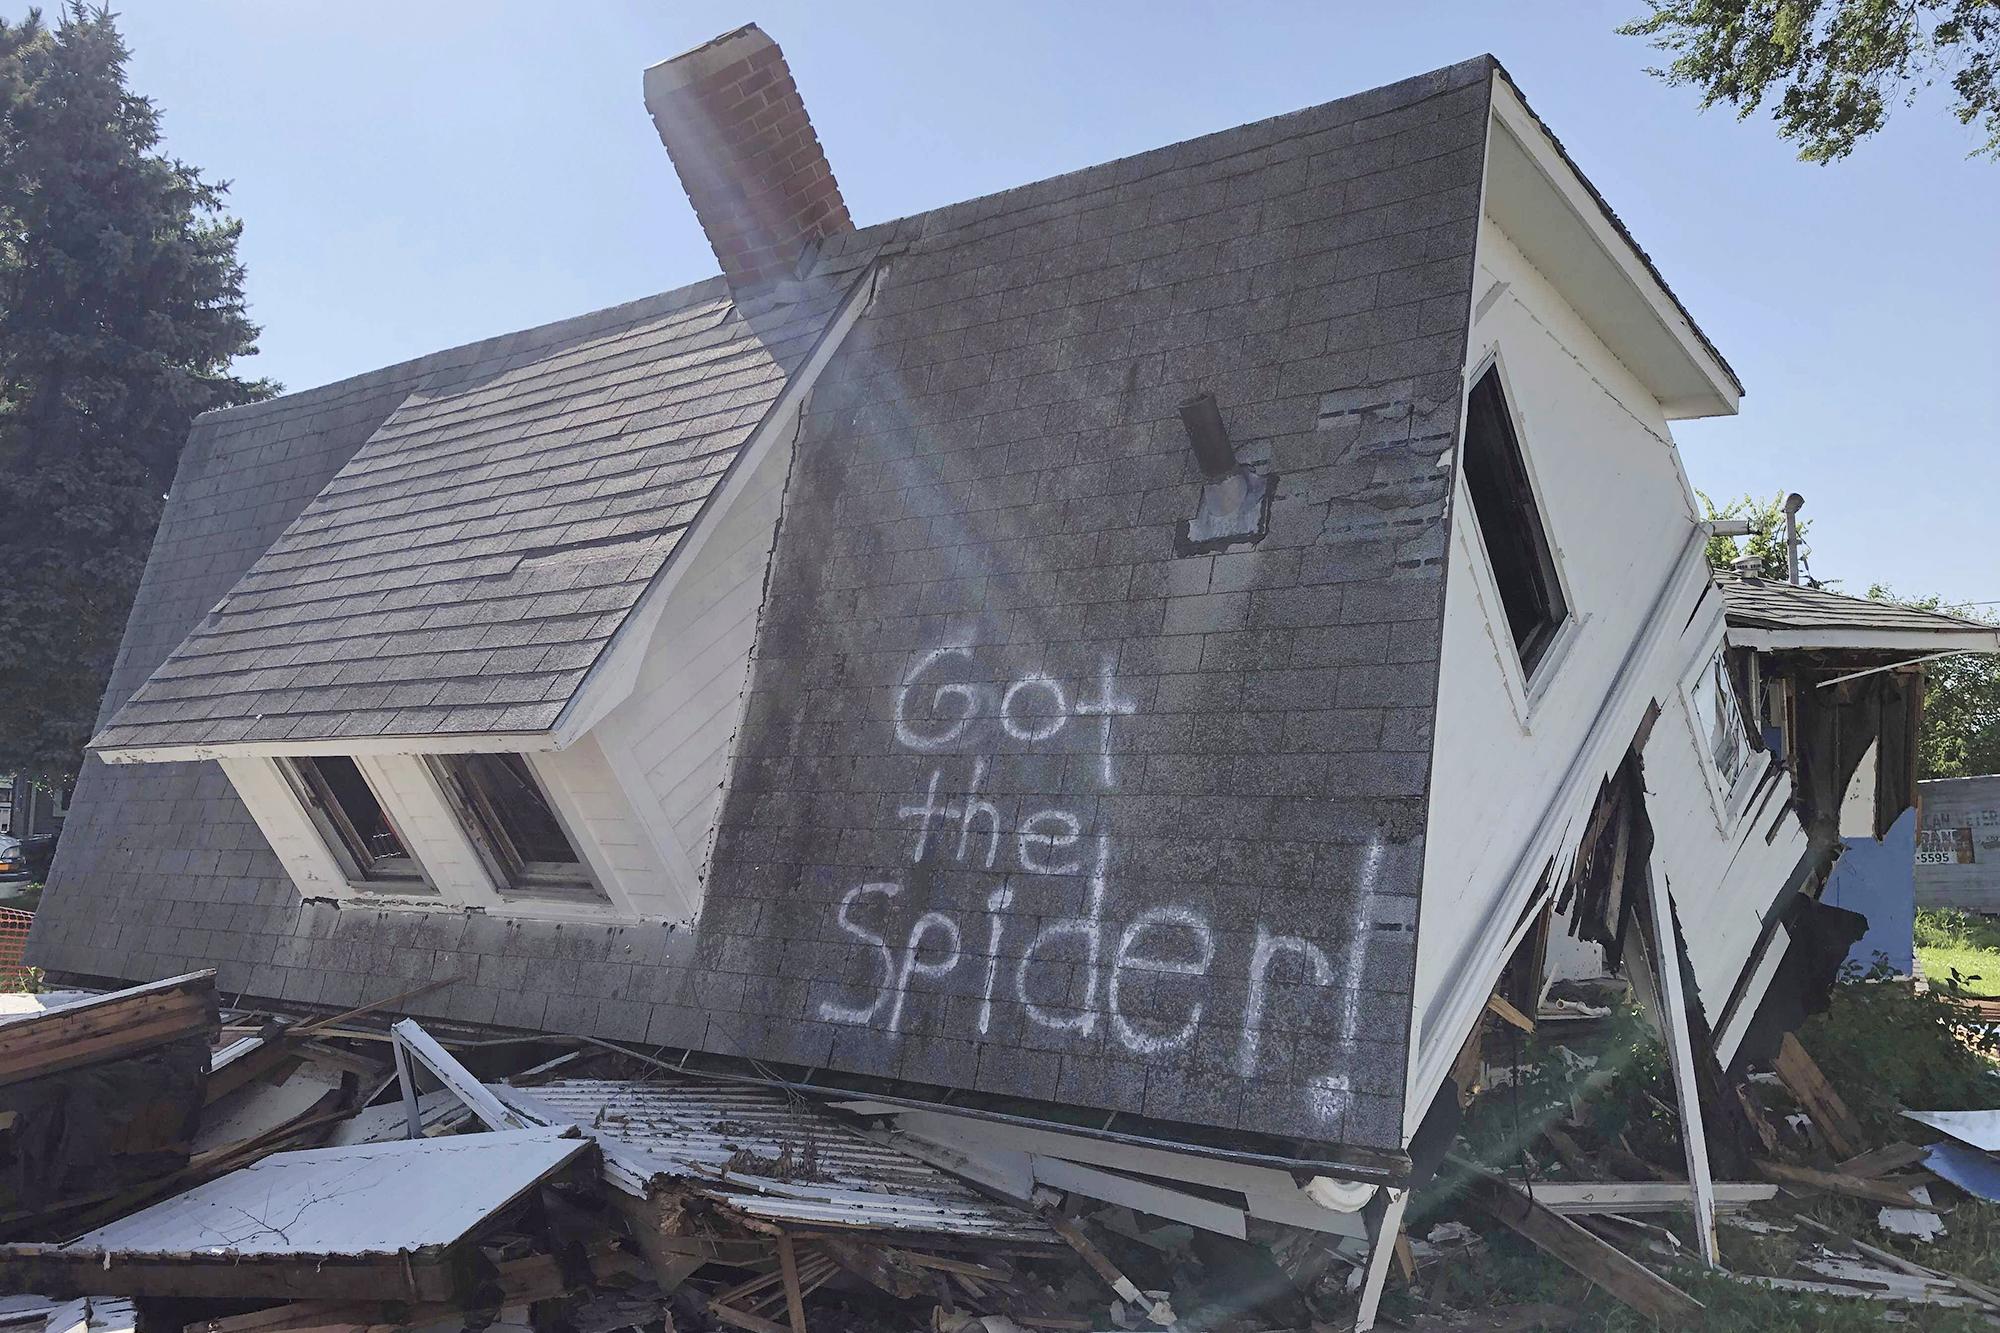 Got the spider!': Couple's joke on demolished house goes viral